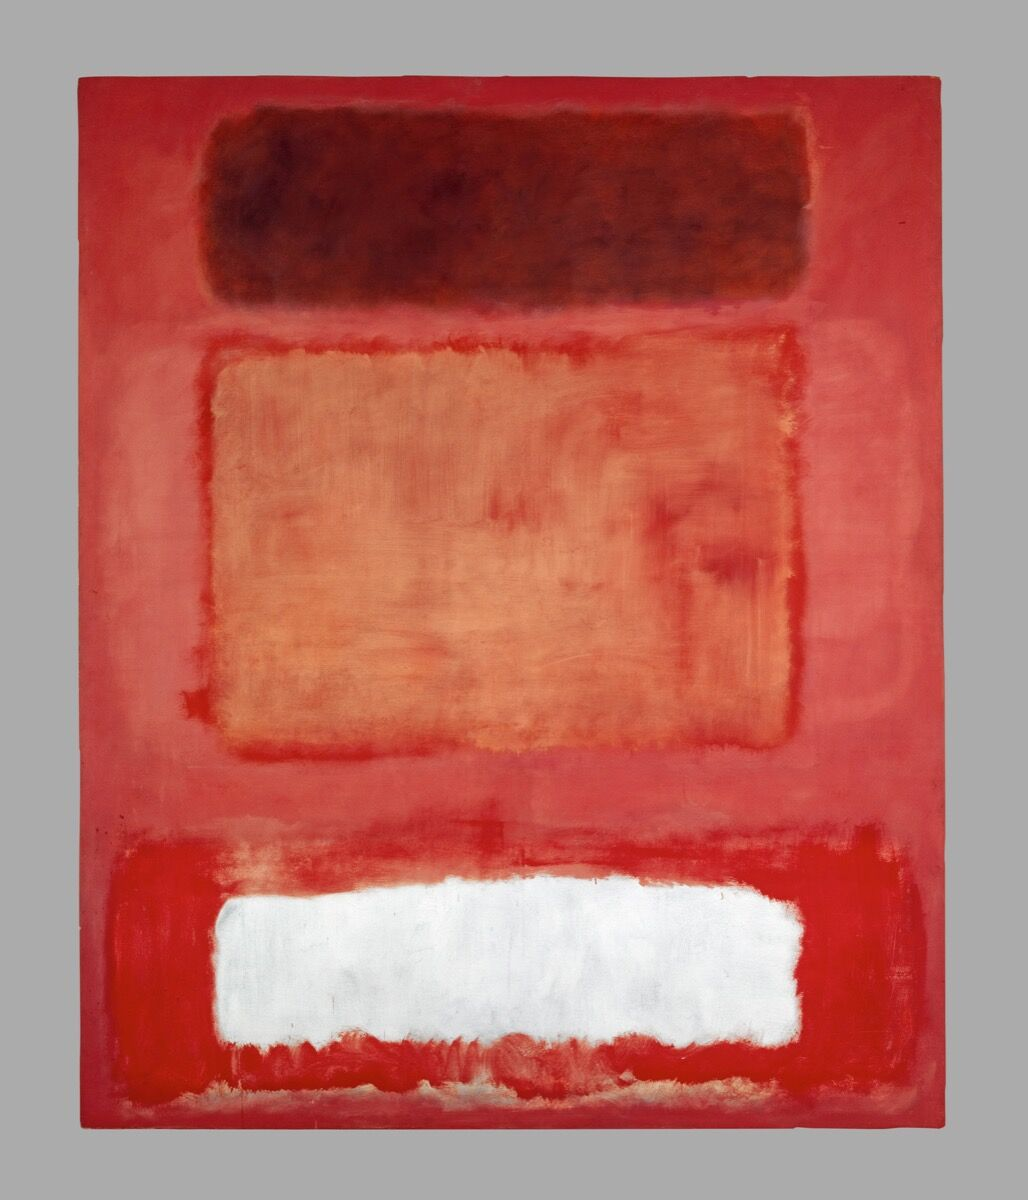 Mark Rothko, No. 16 (Red, White and Brown), 1957. © 1998 Kate Rothko Prizel & Christopher Rothko / Bildrecht, Vienna, 2019. Photo © Kunstmuseum Basel.